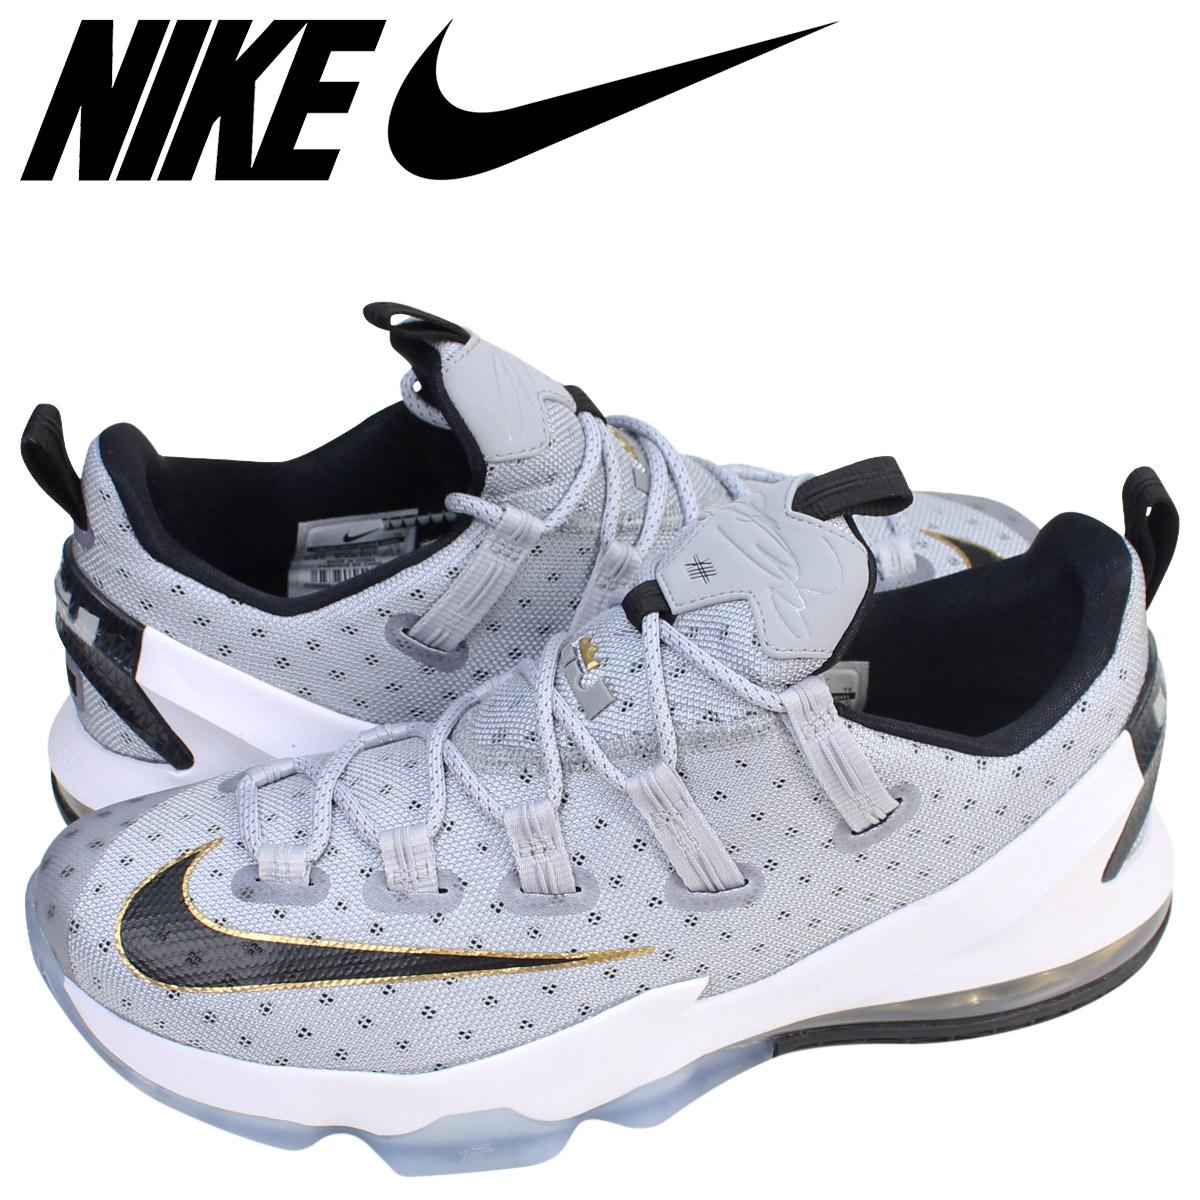 4ca3e5106eb Whats up Sports  Nike NIKE Revlon 13 sneakers LEBRON 13 LOW EP ...